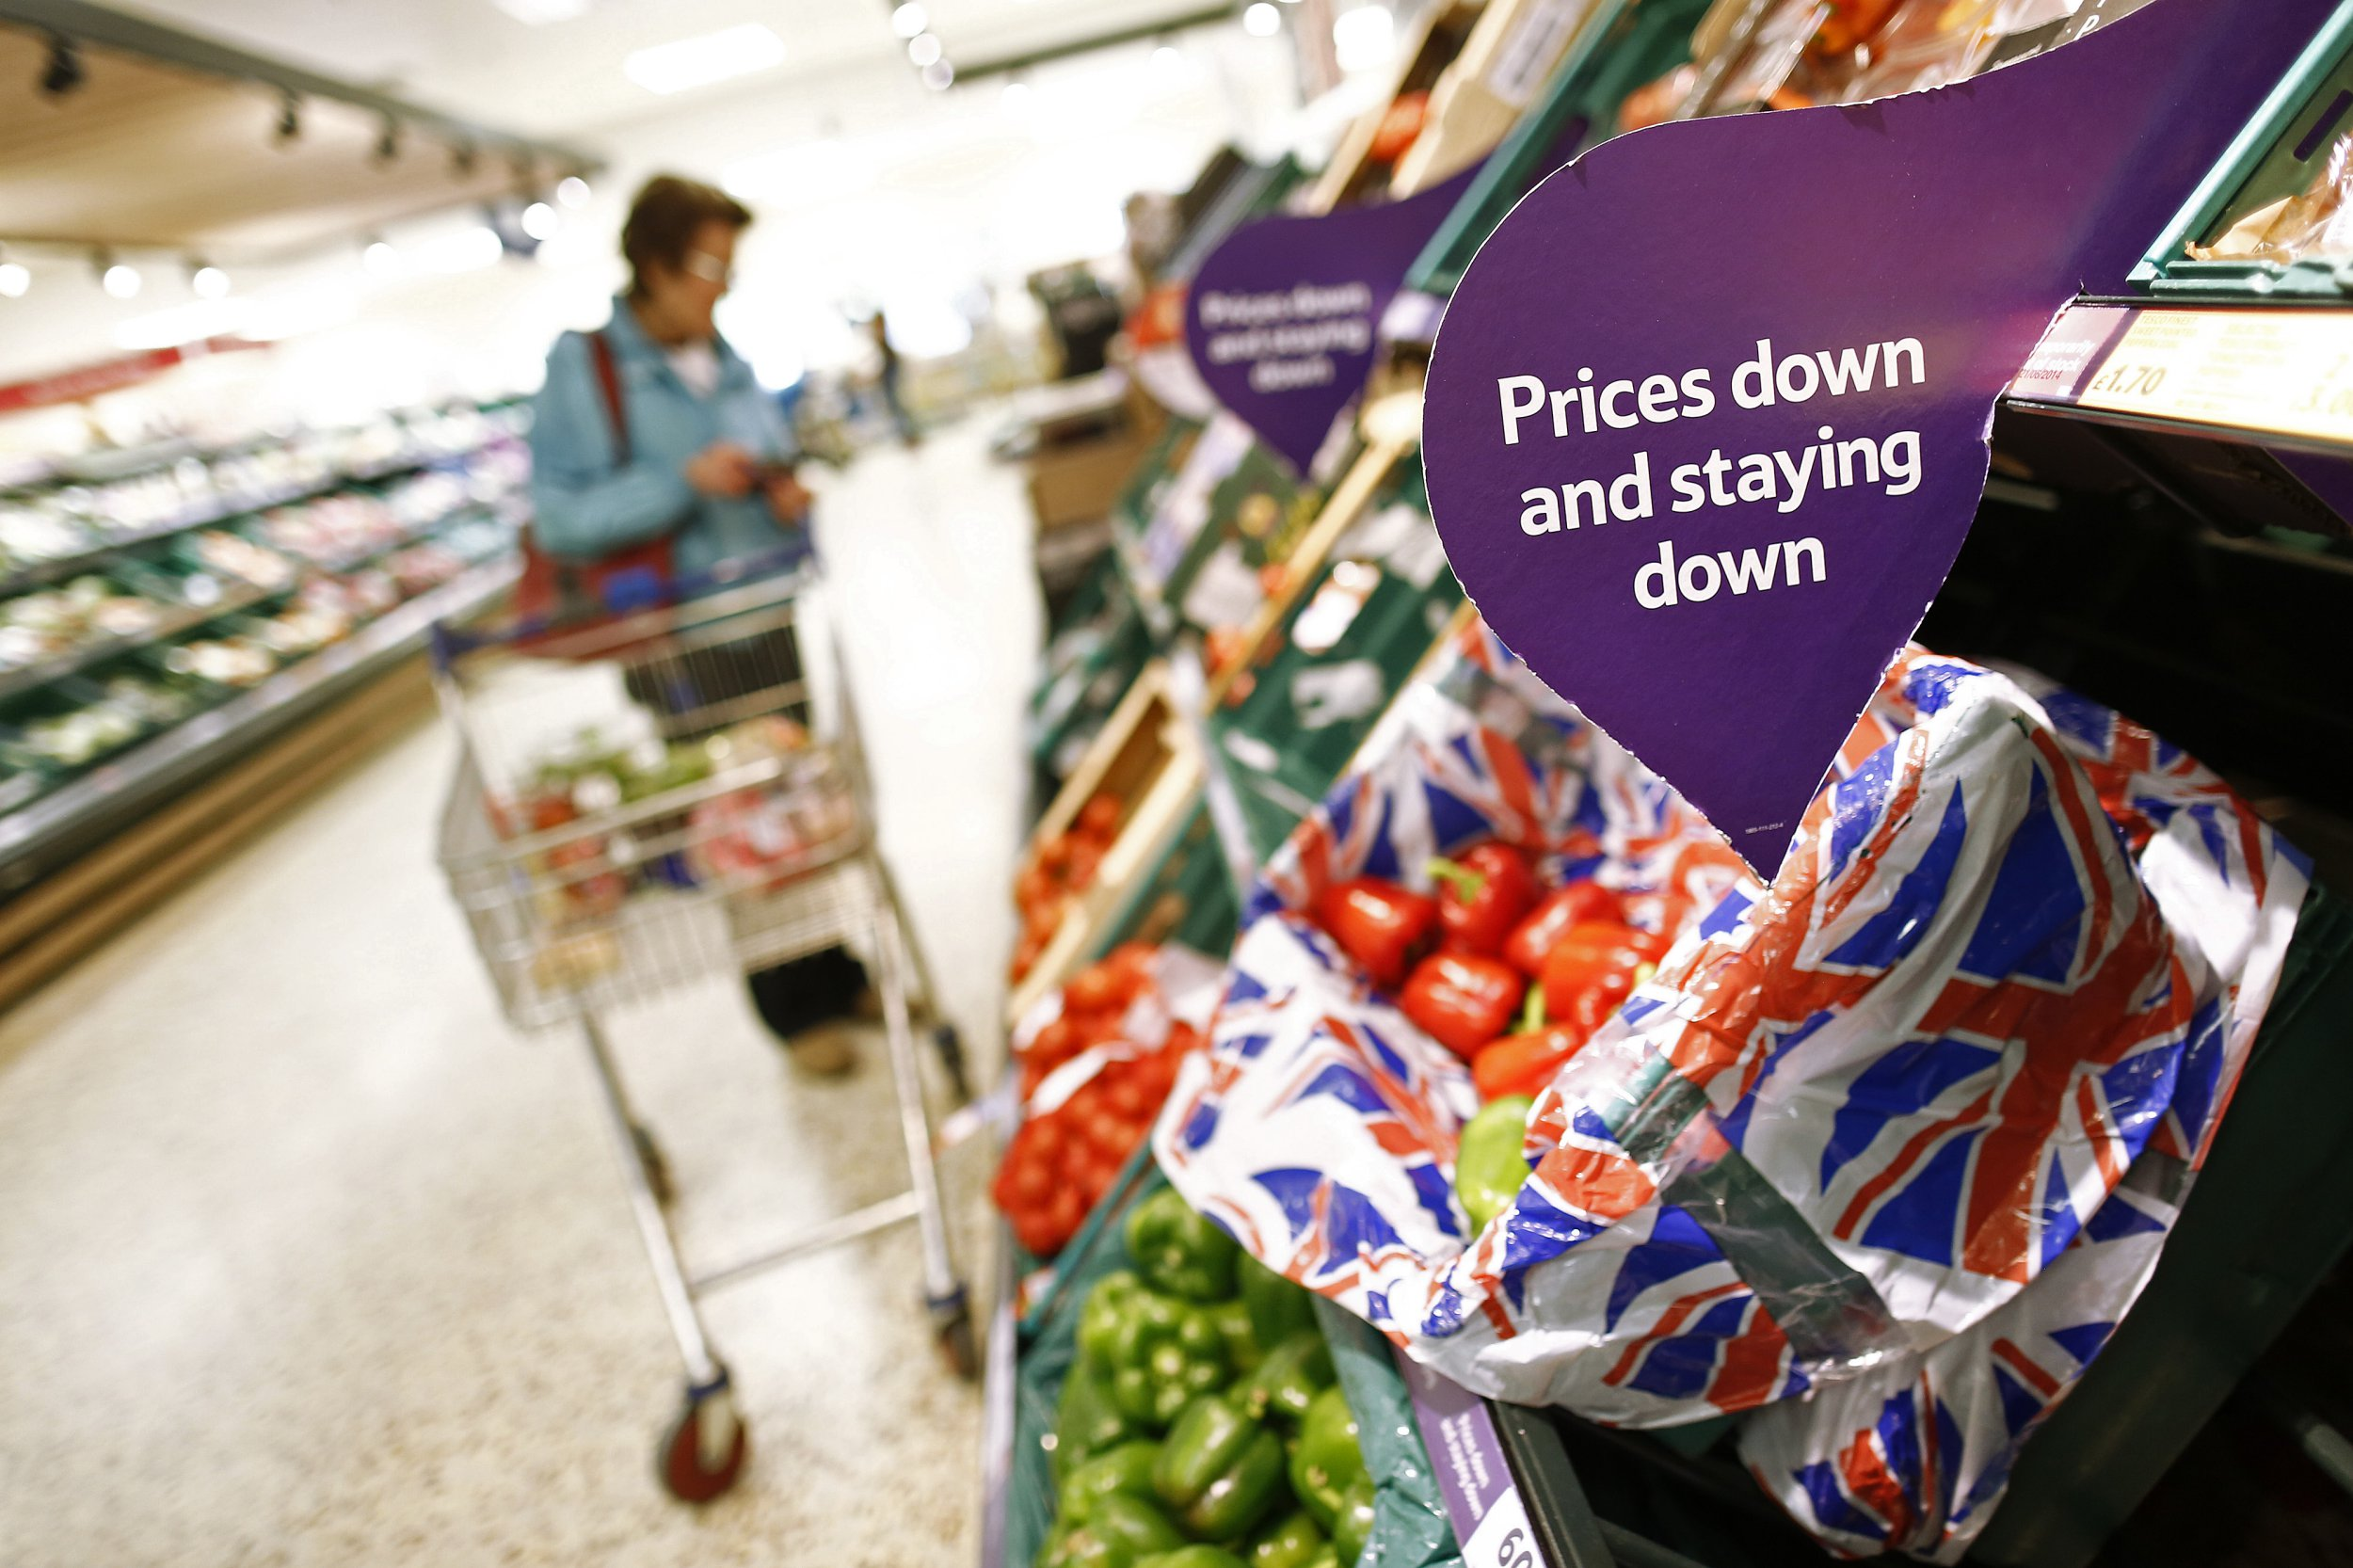 Tesco scraps 'best before' dates to help reduce food waste